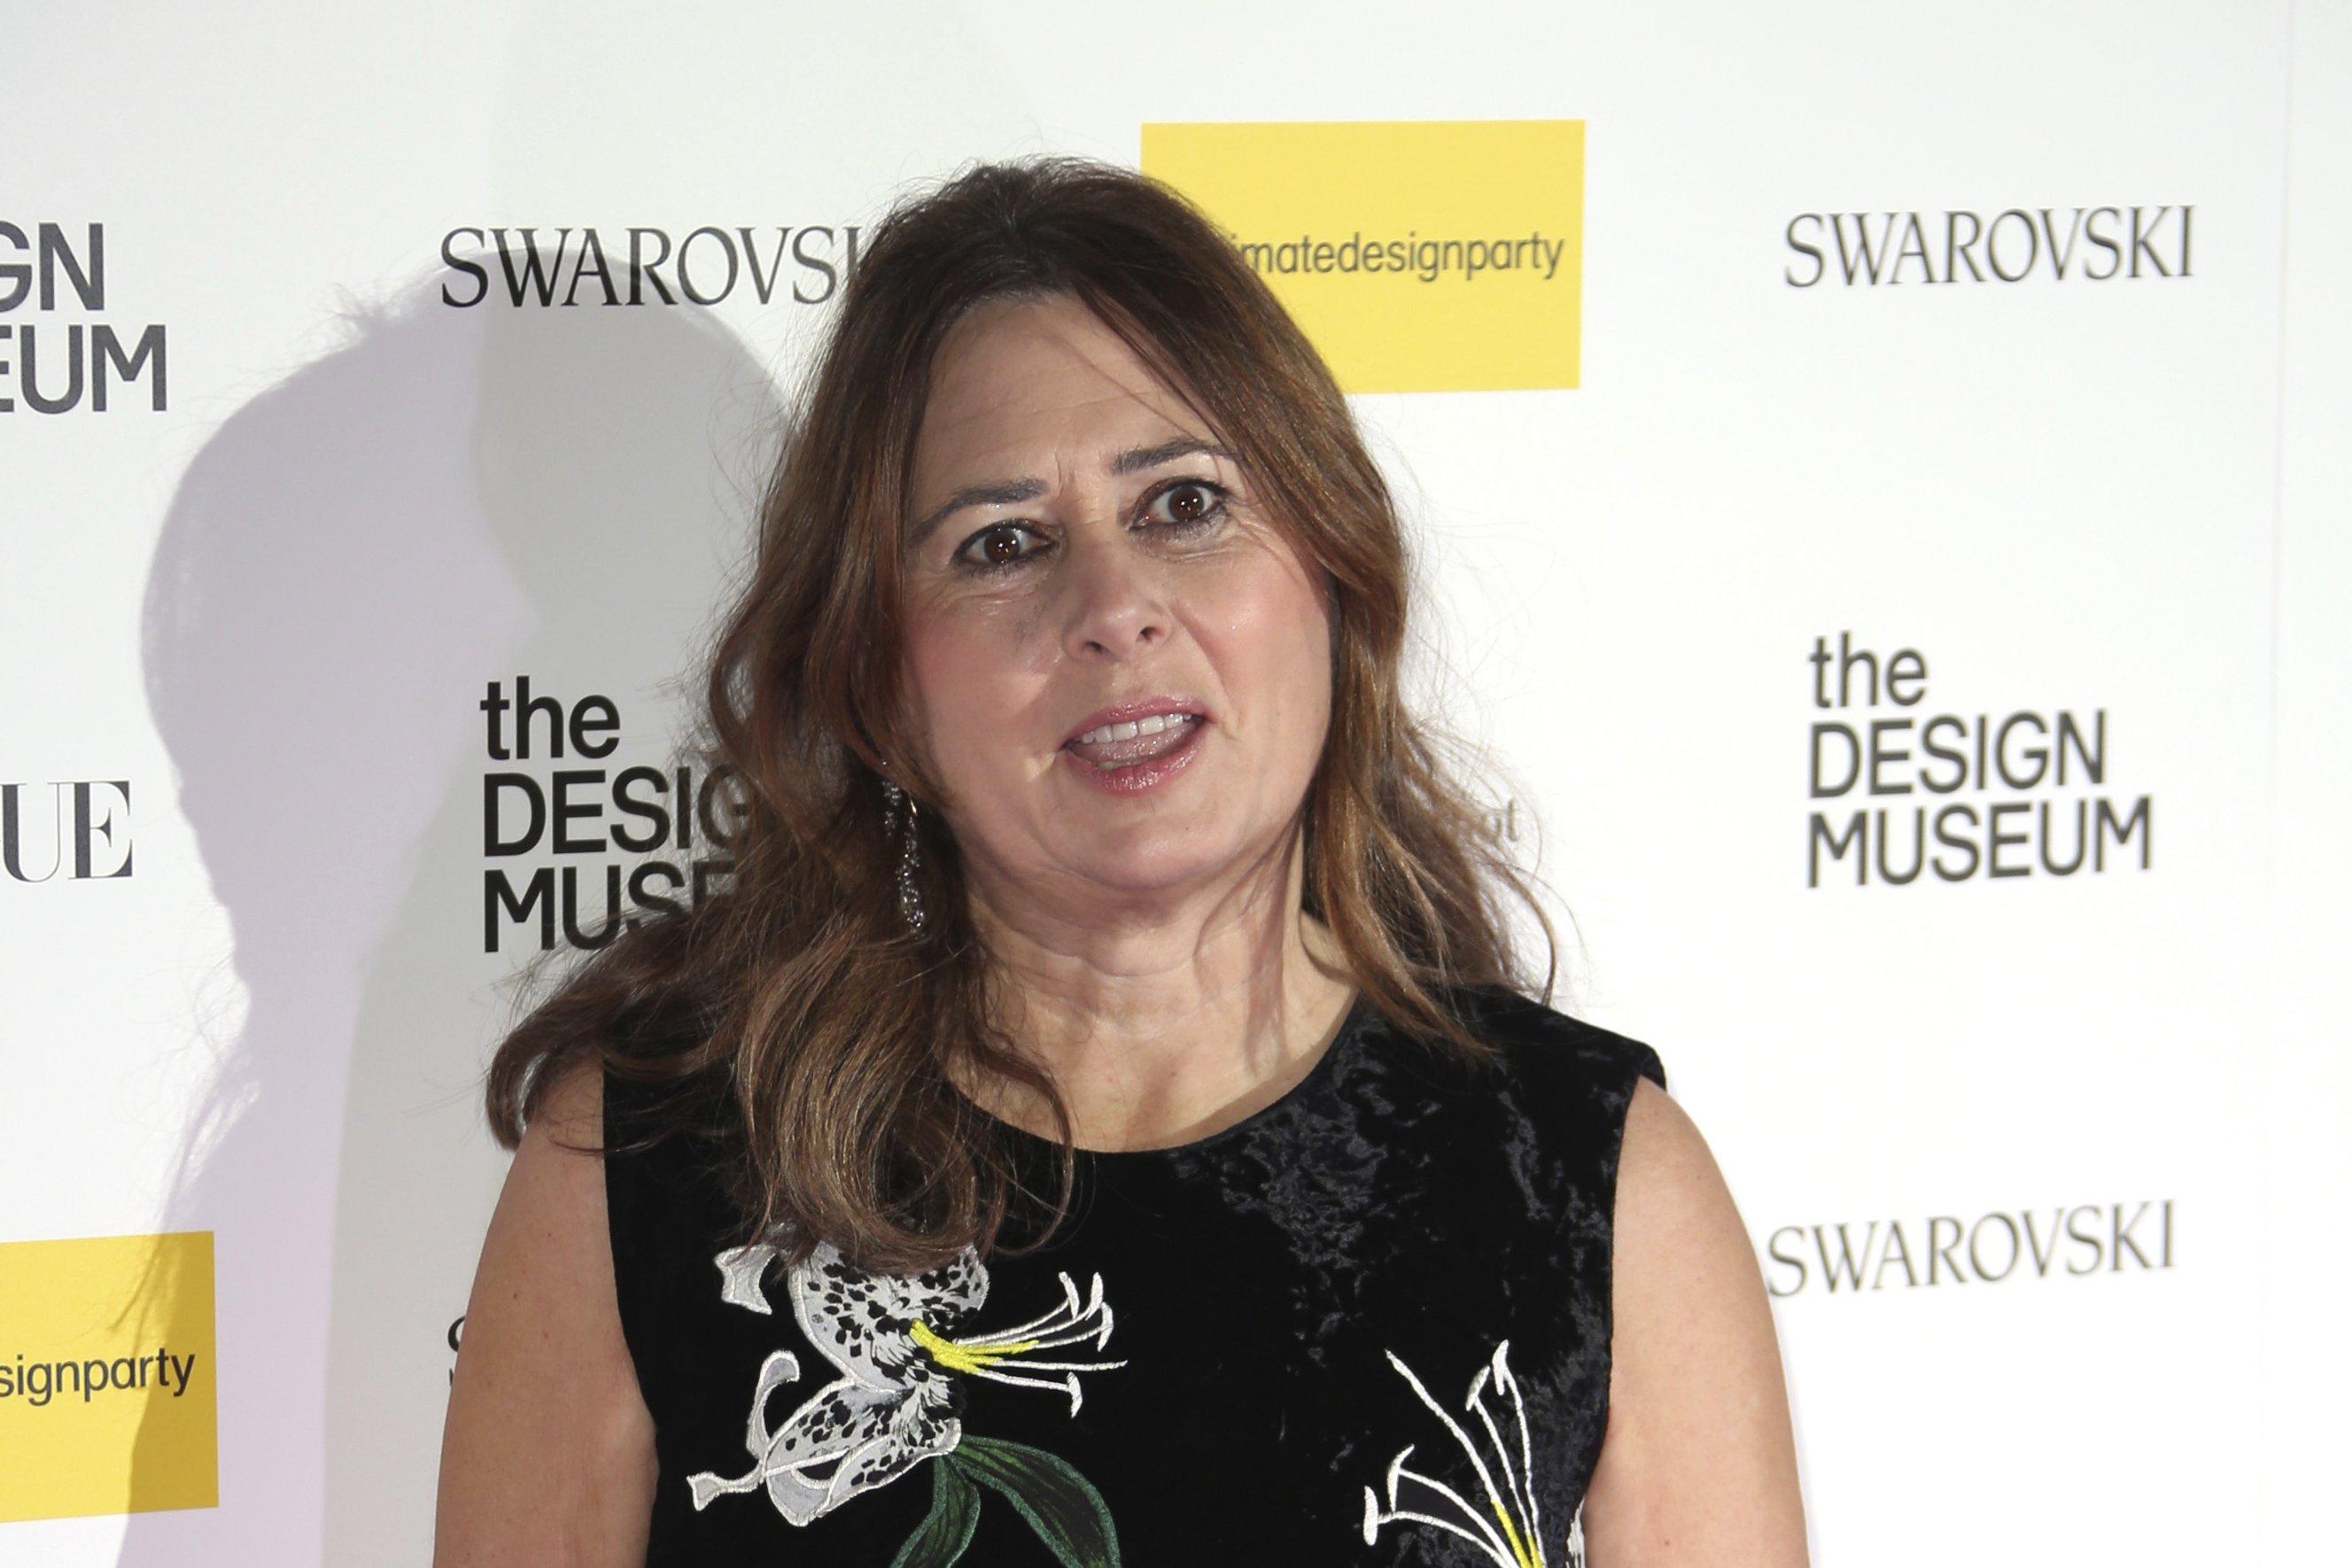 Longtime British Vogue editor Alexandra Shulman to step down